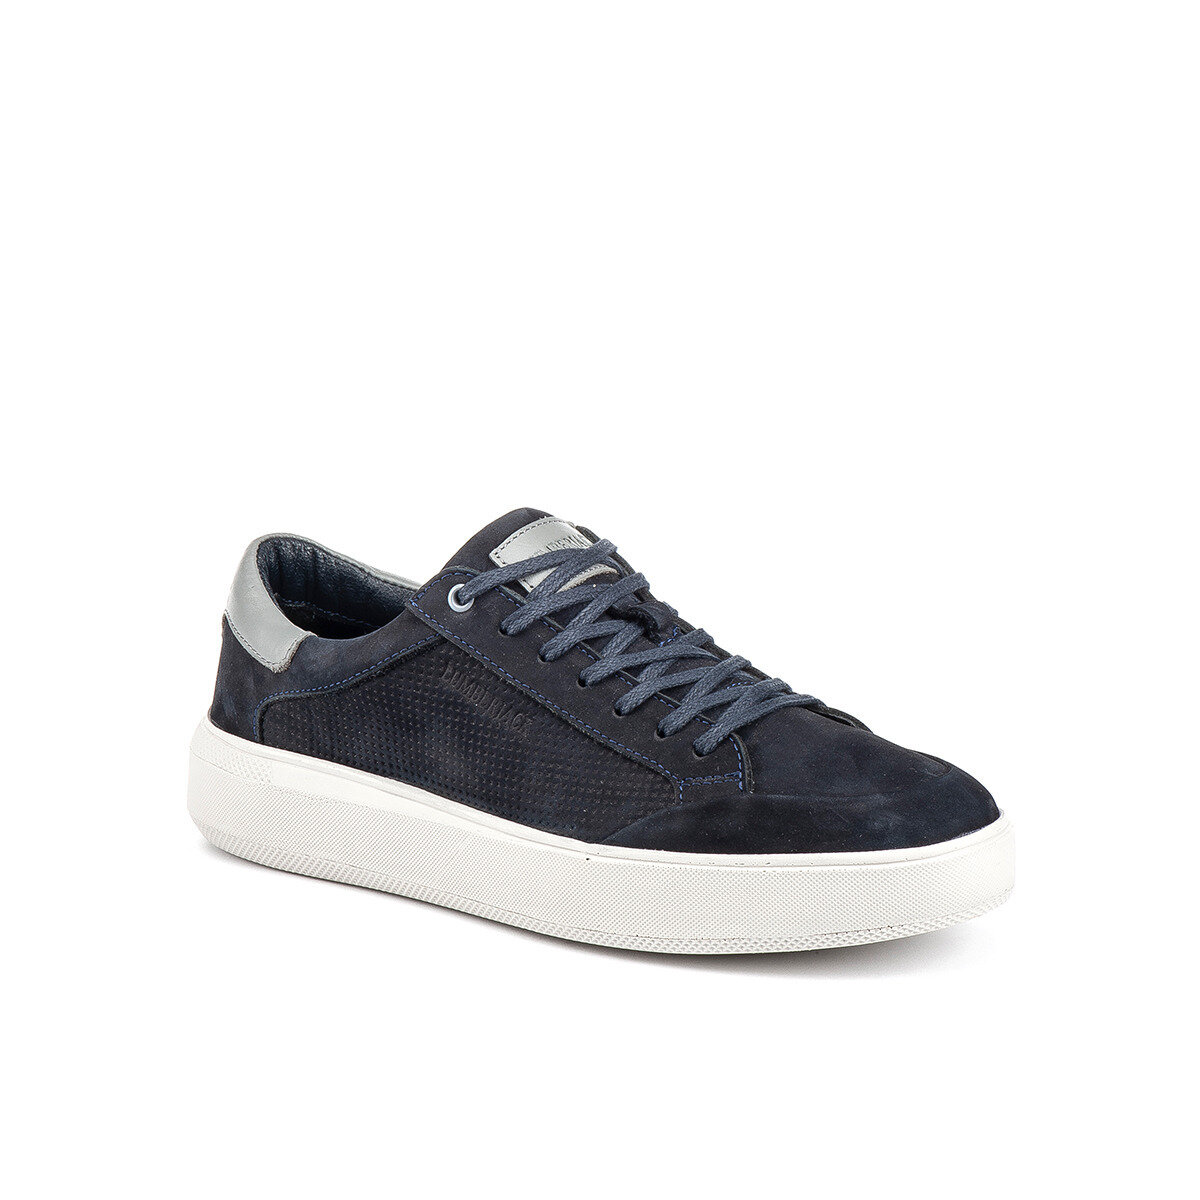 ORTON Sneakers Uomo